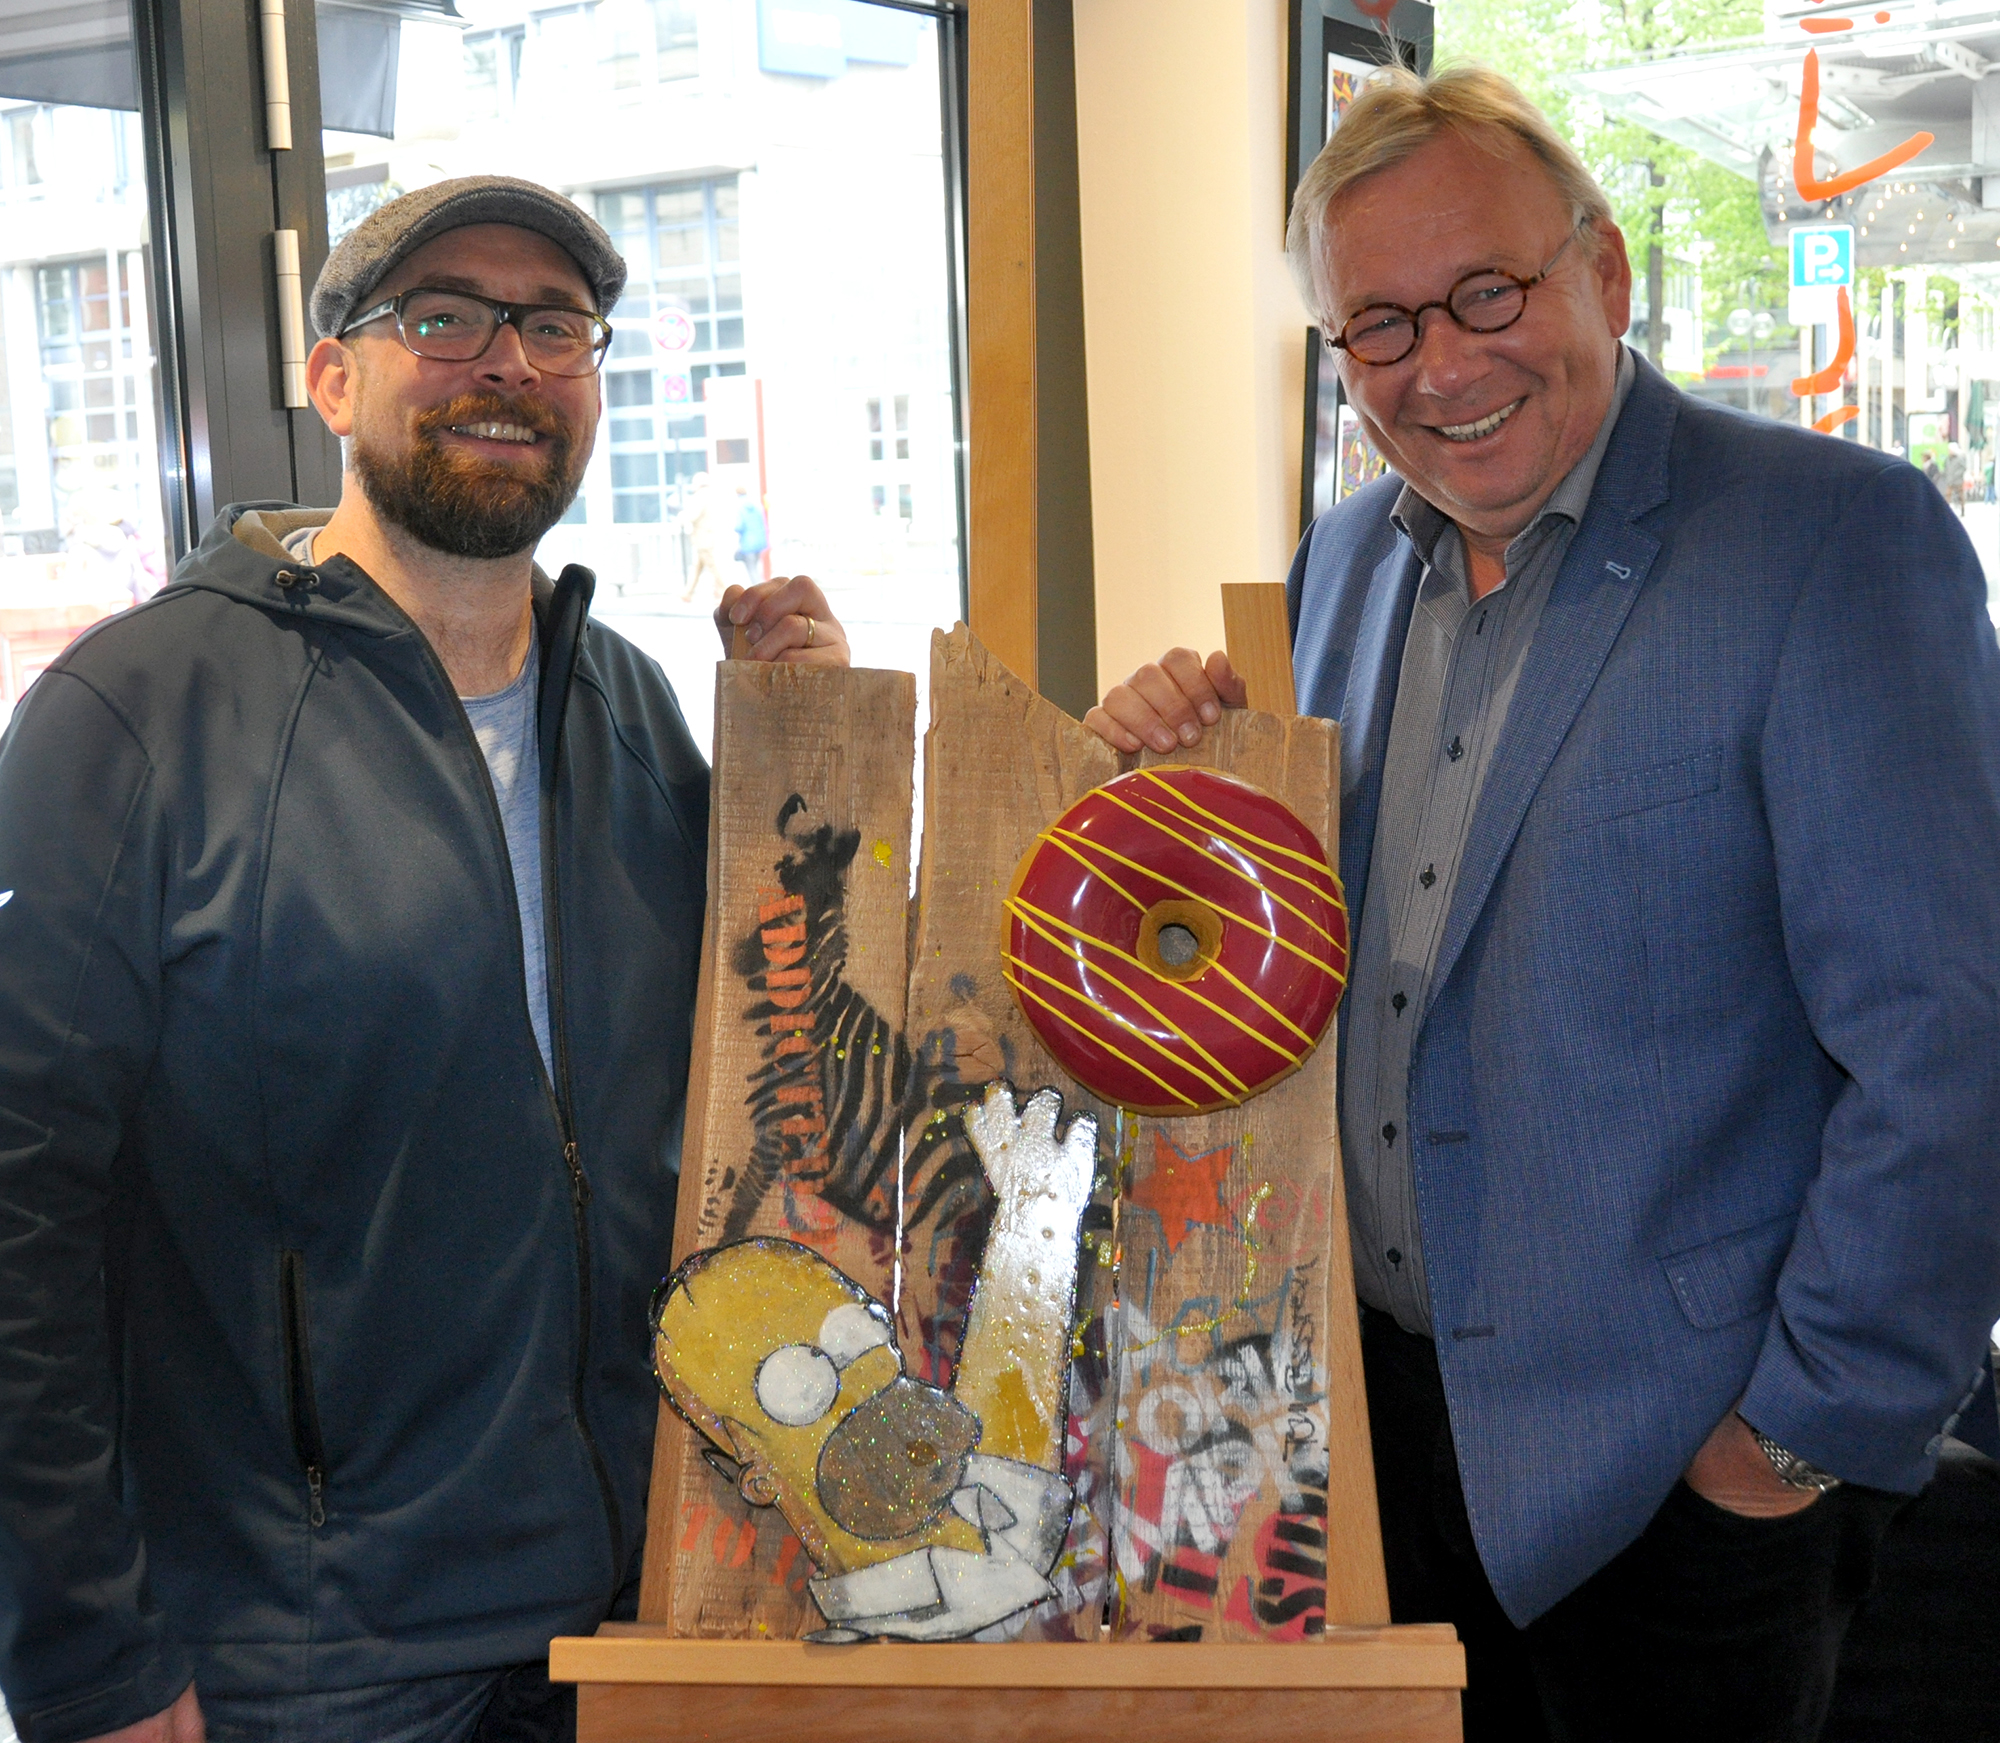 Tom Boston mit Bernd Stelter in Köln